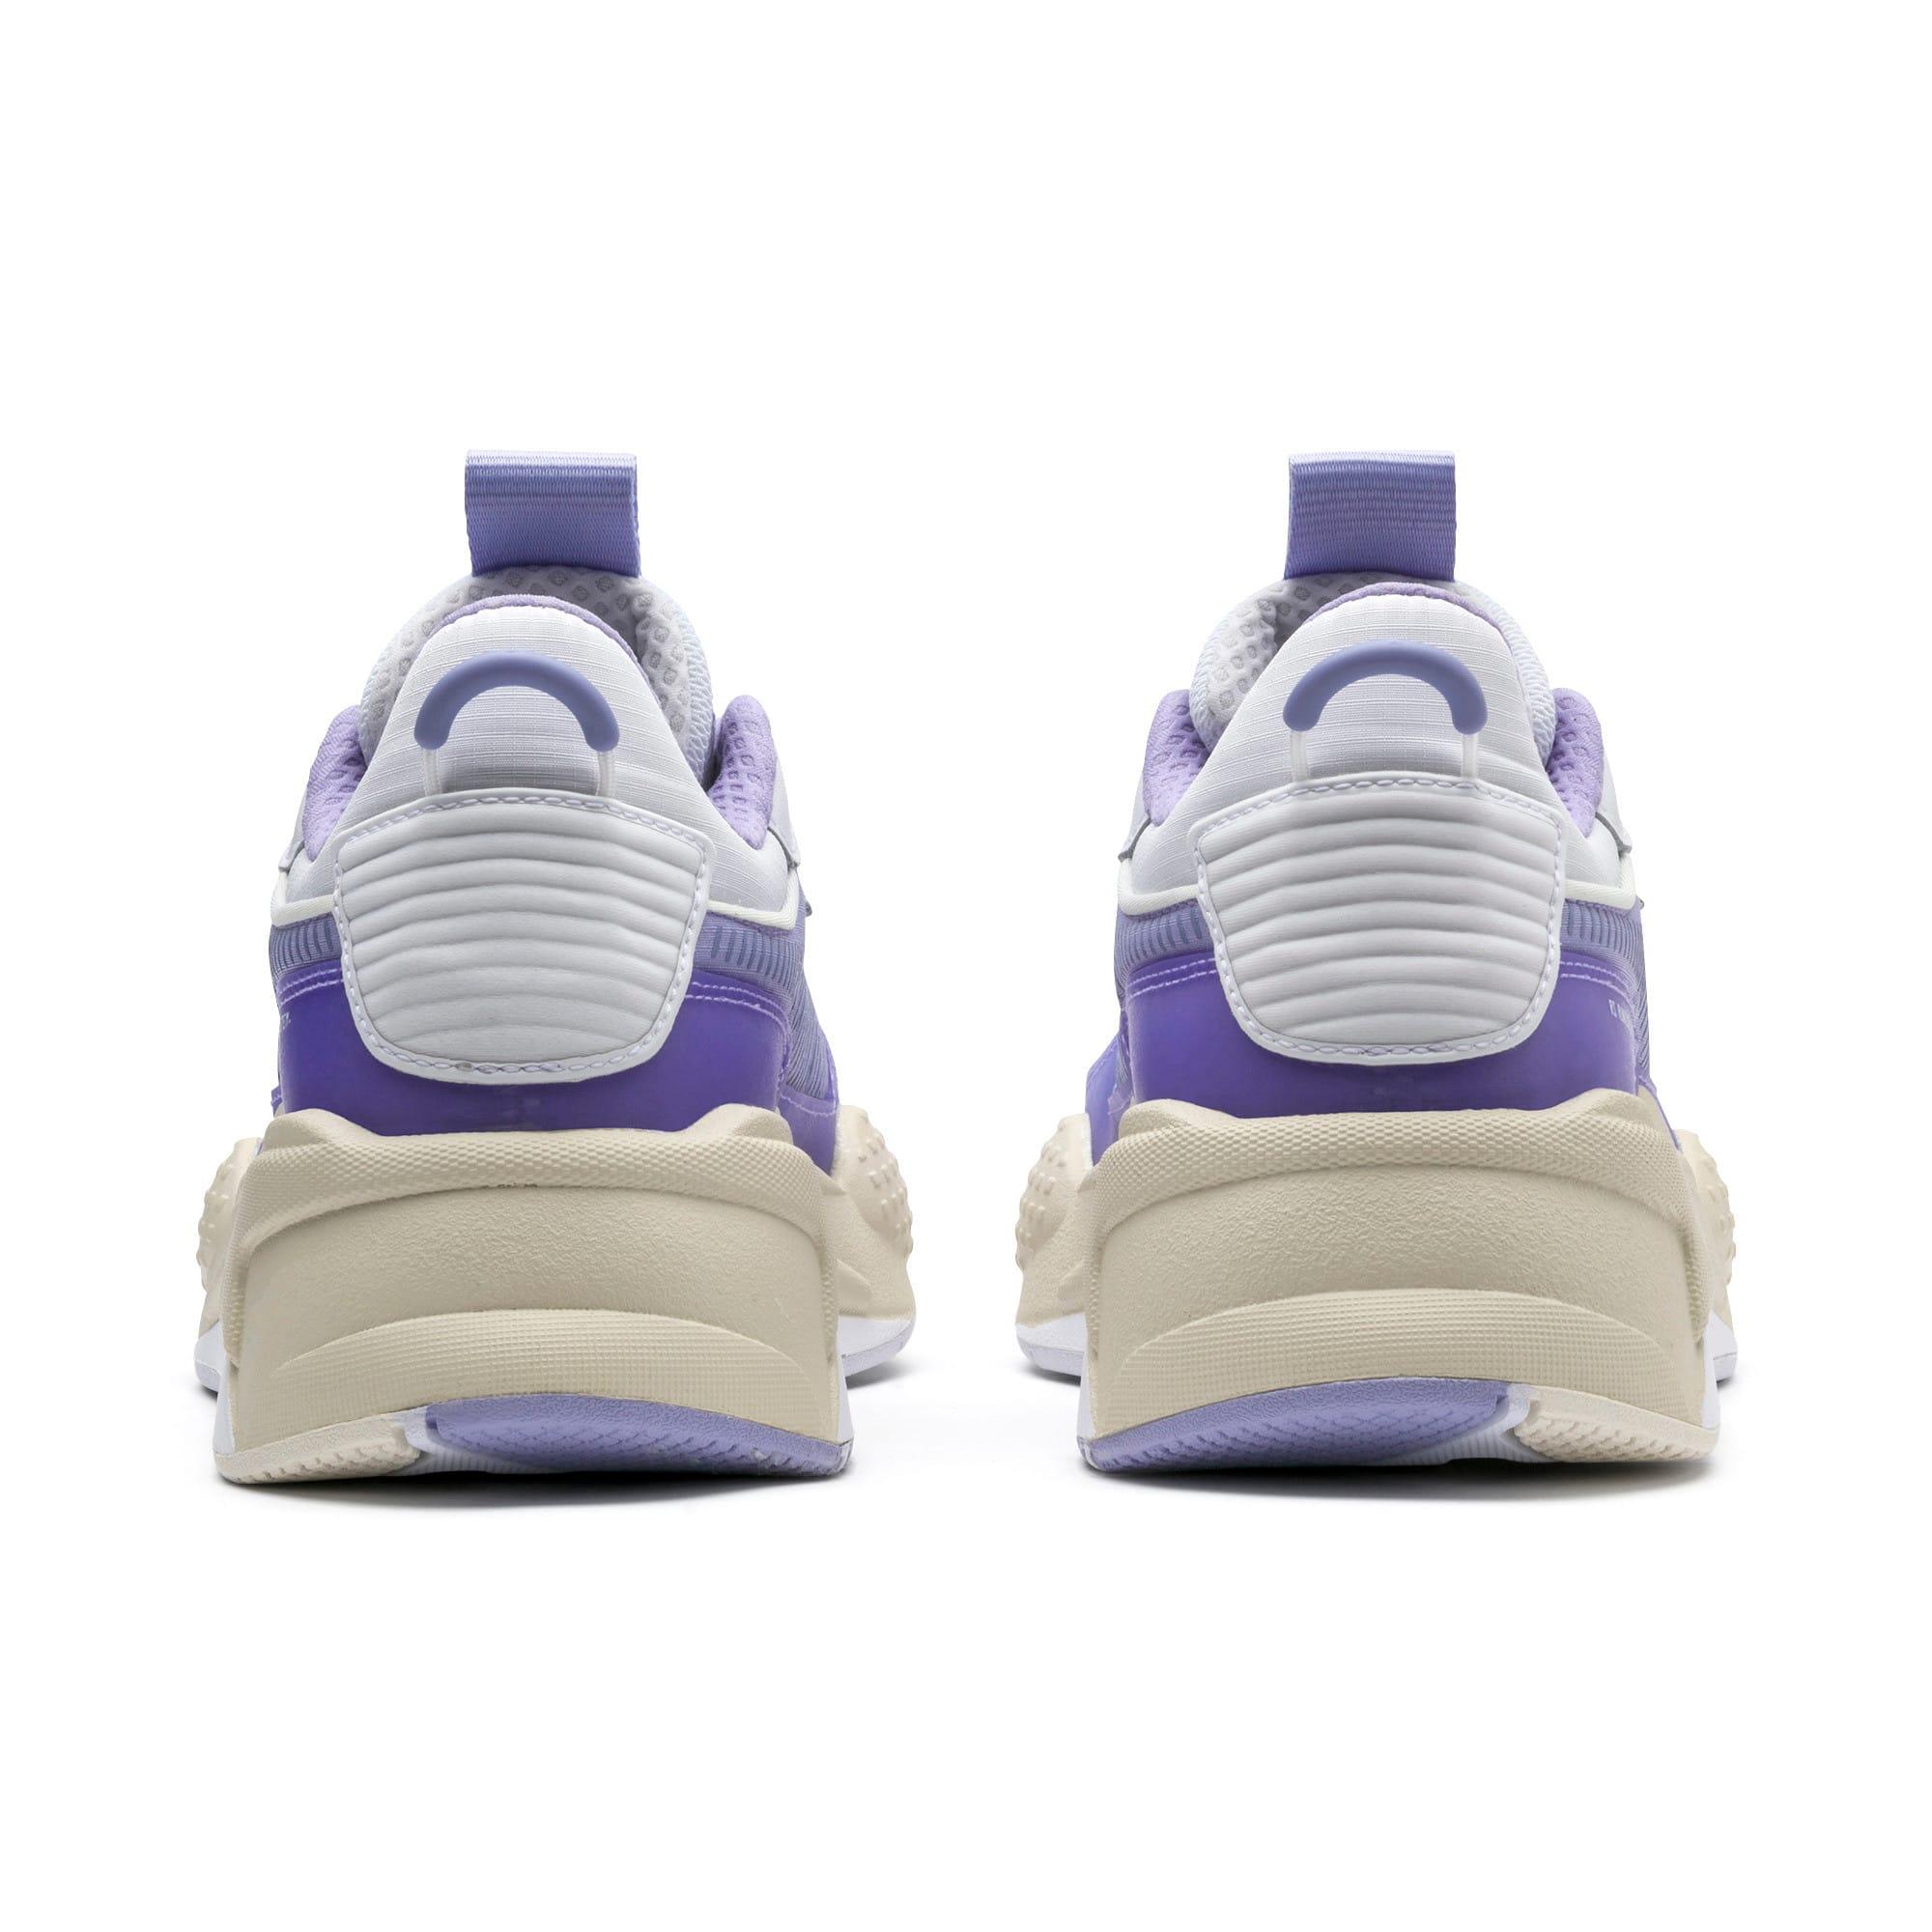 Thumbnail 3 of RS-X Tech Sneaker, Puma White-Sweet Lavender, medium